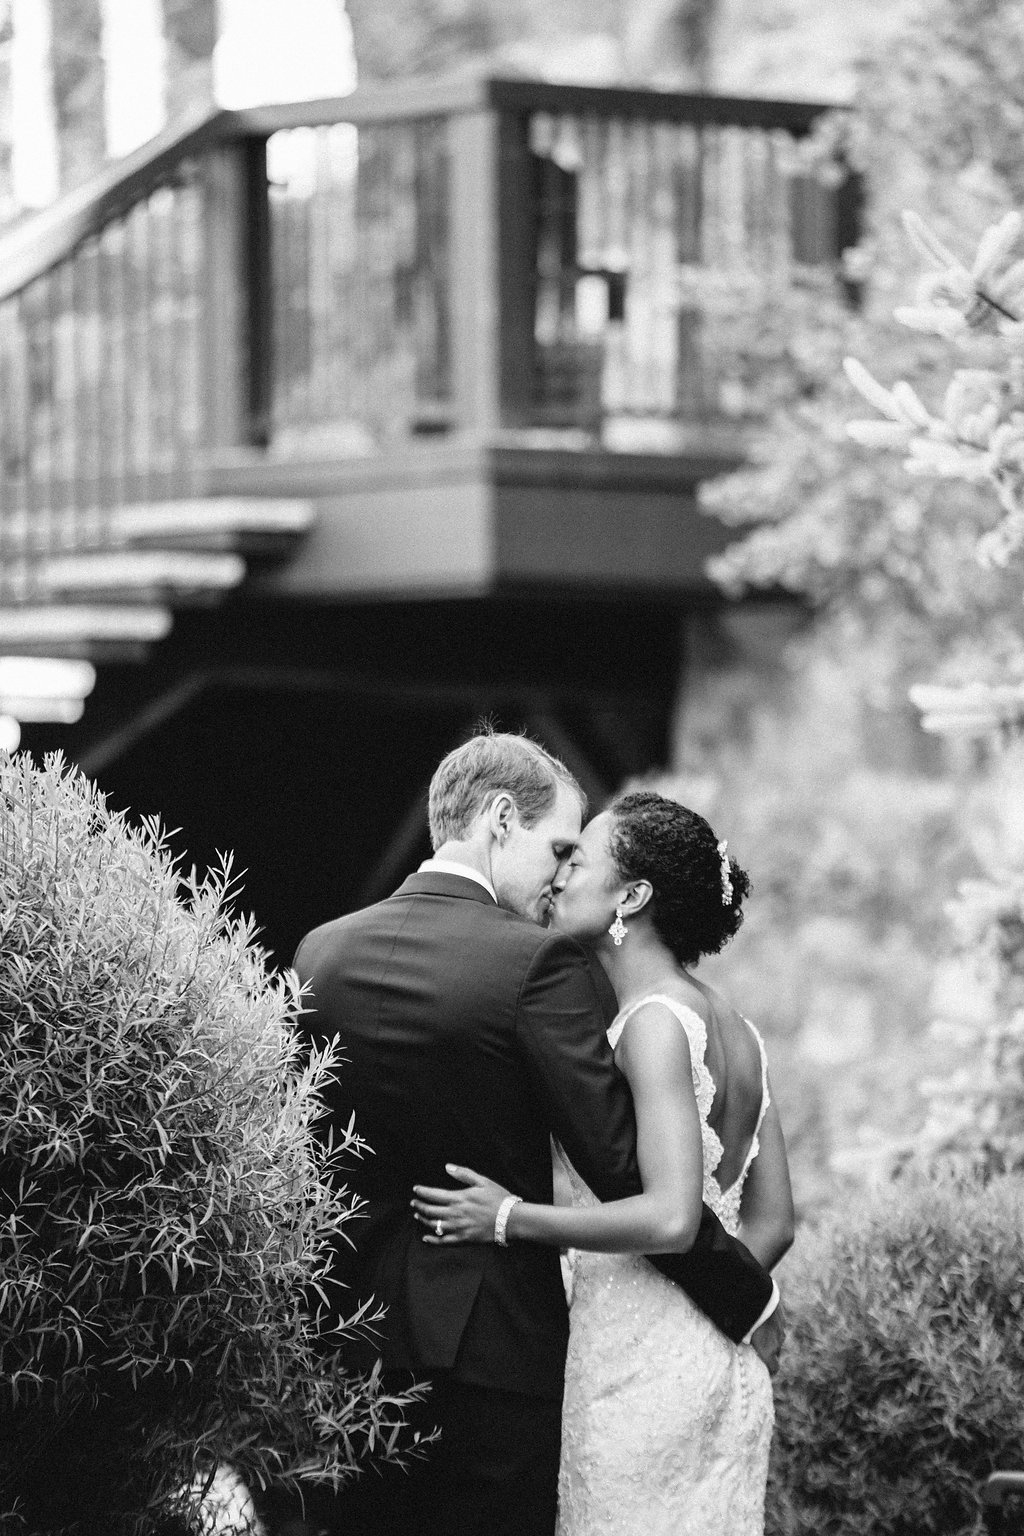 waldorf-astoria-wedding-park-city18.jpg